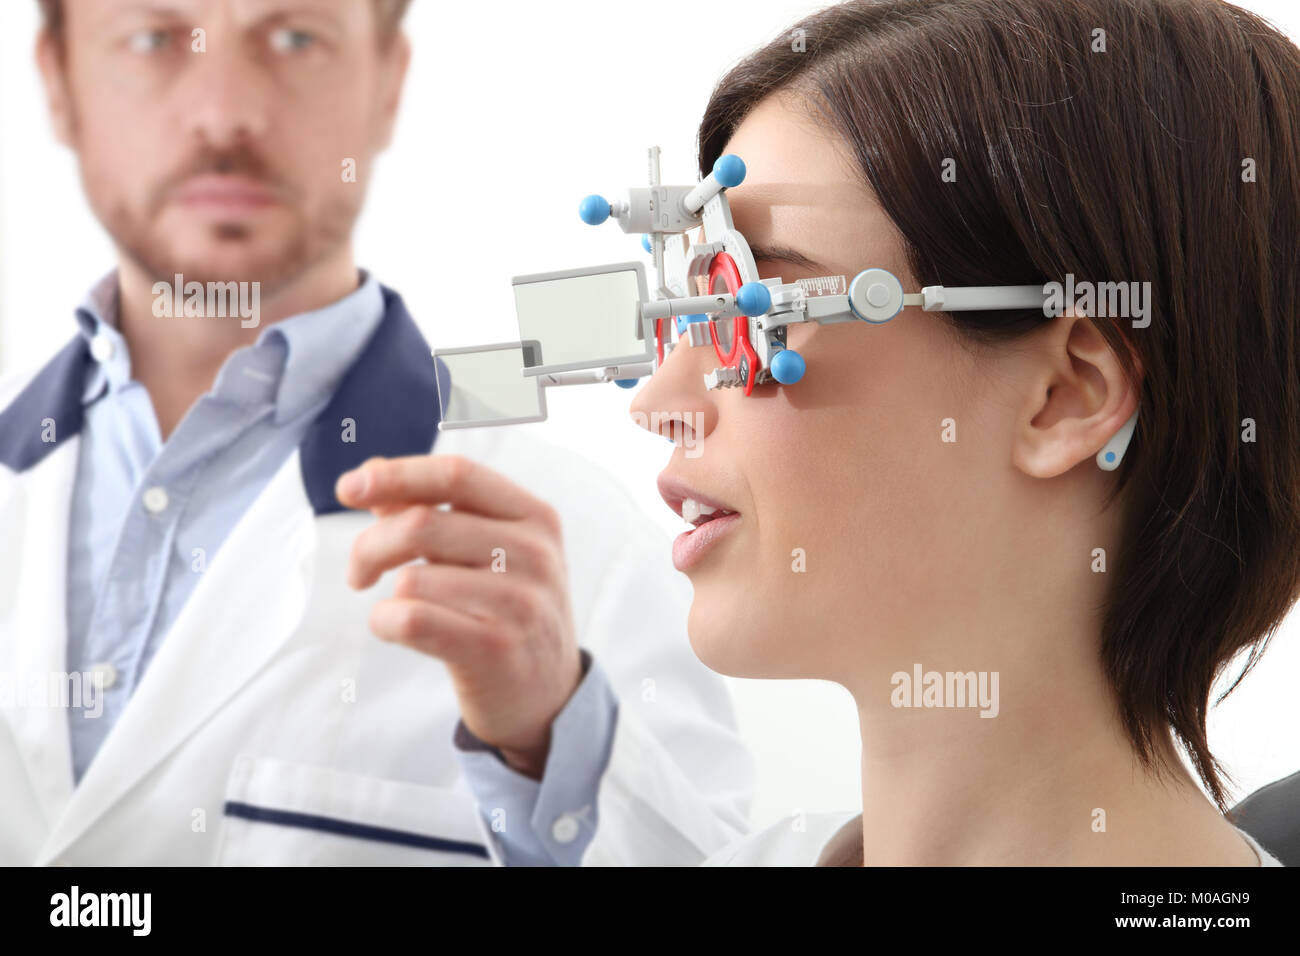 Optometric Instrument Stockfotos & Optometric Instrument Bilder - Alamy